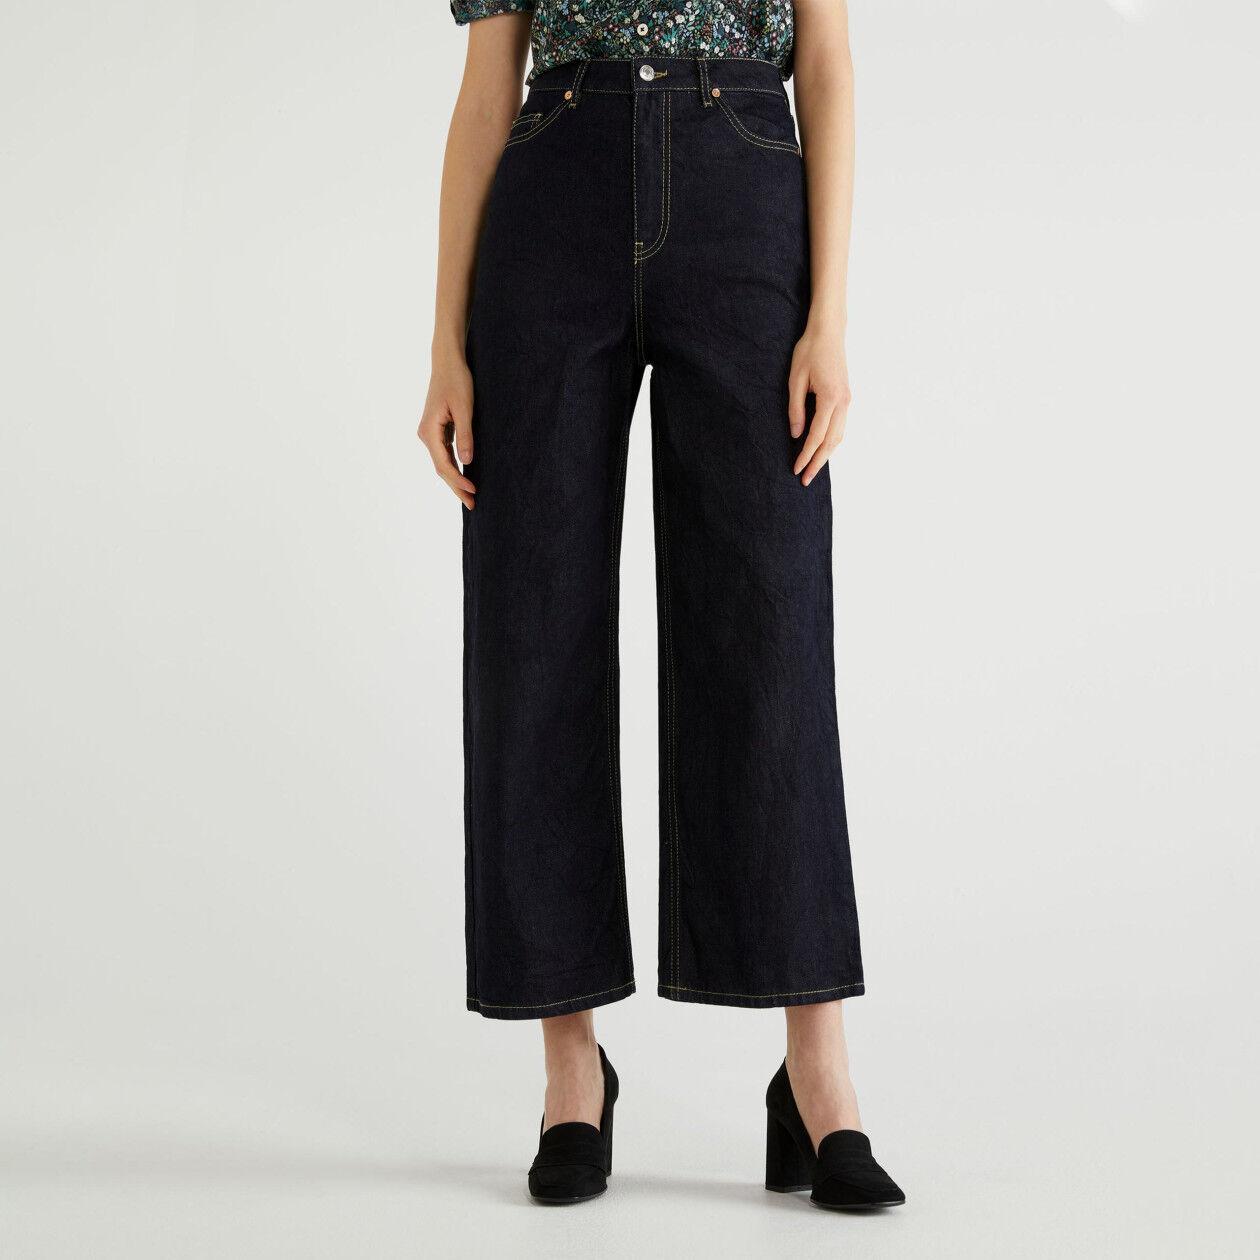 Jeans aus stretchigem Denim im Mum Fit